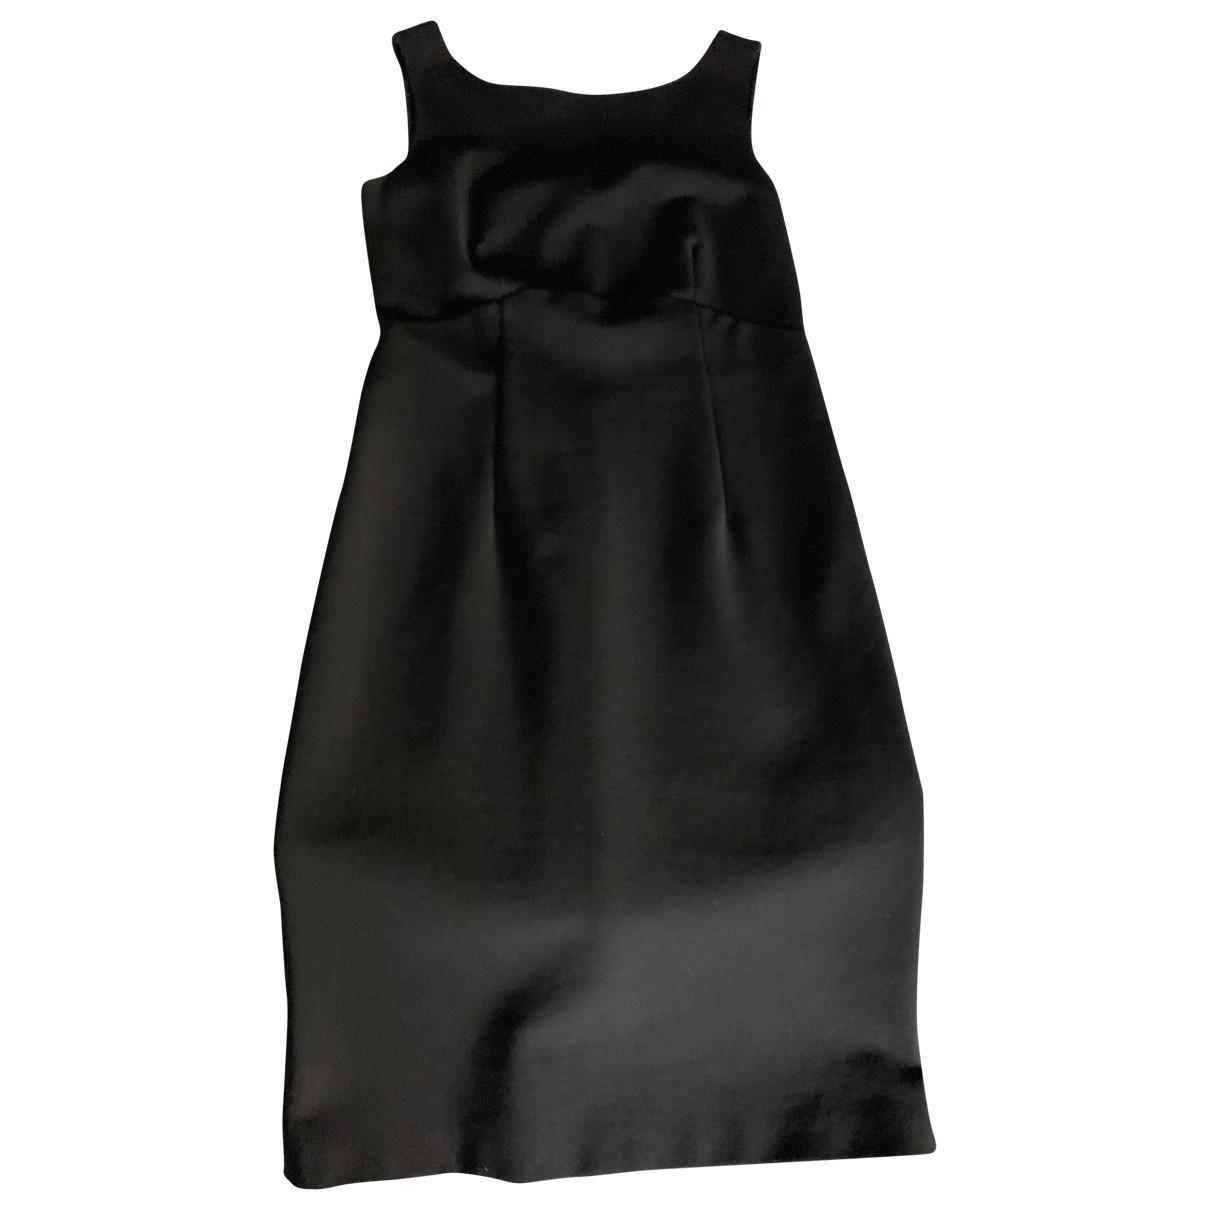 Prada \N Black dress for Women 44 IT